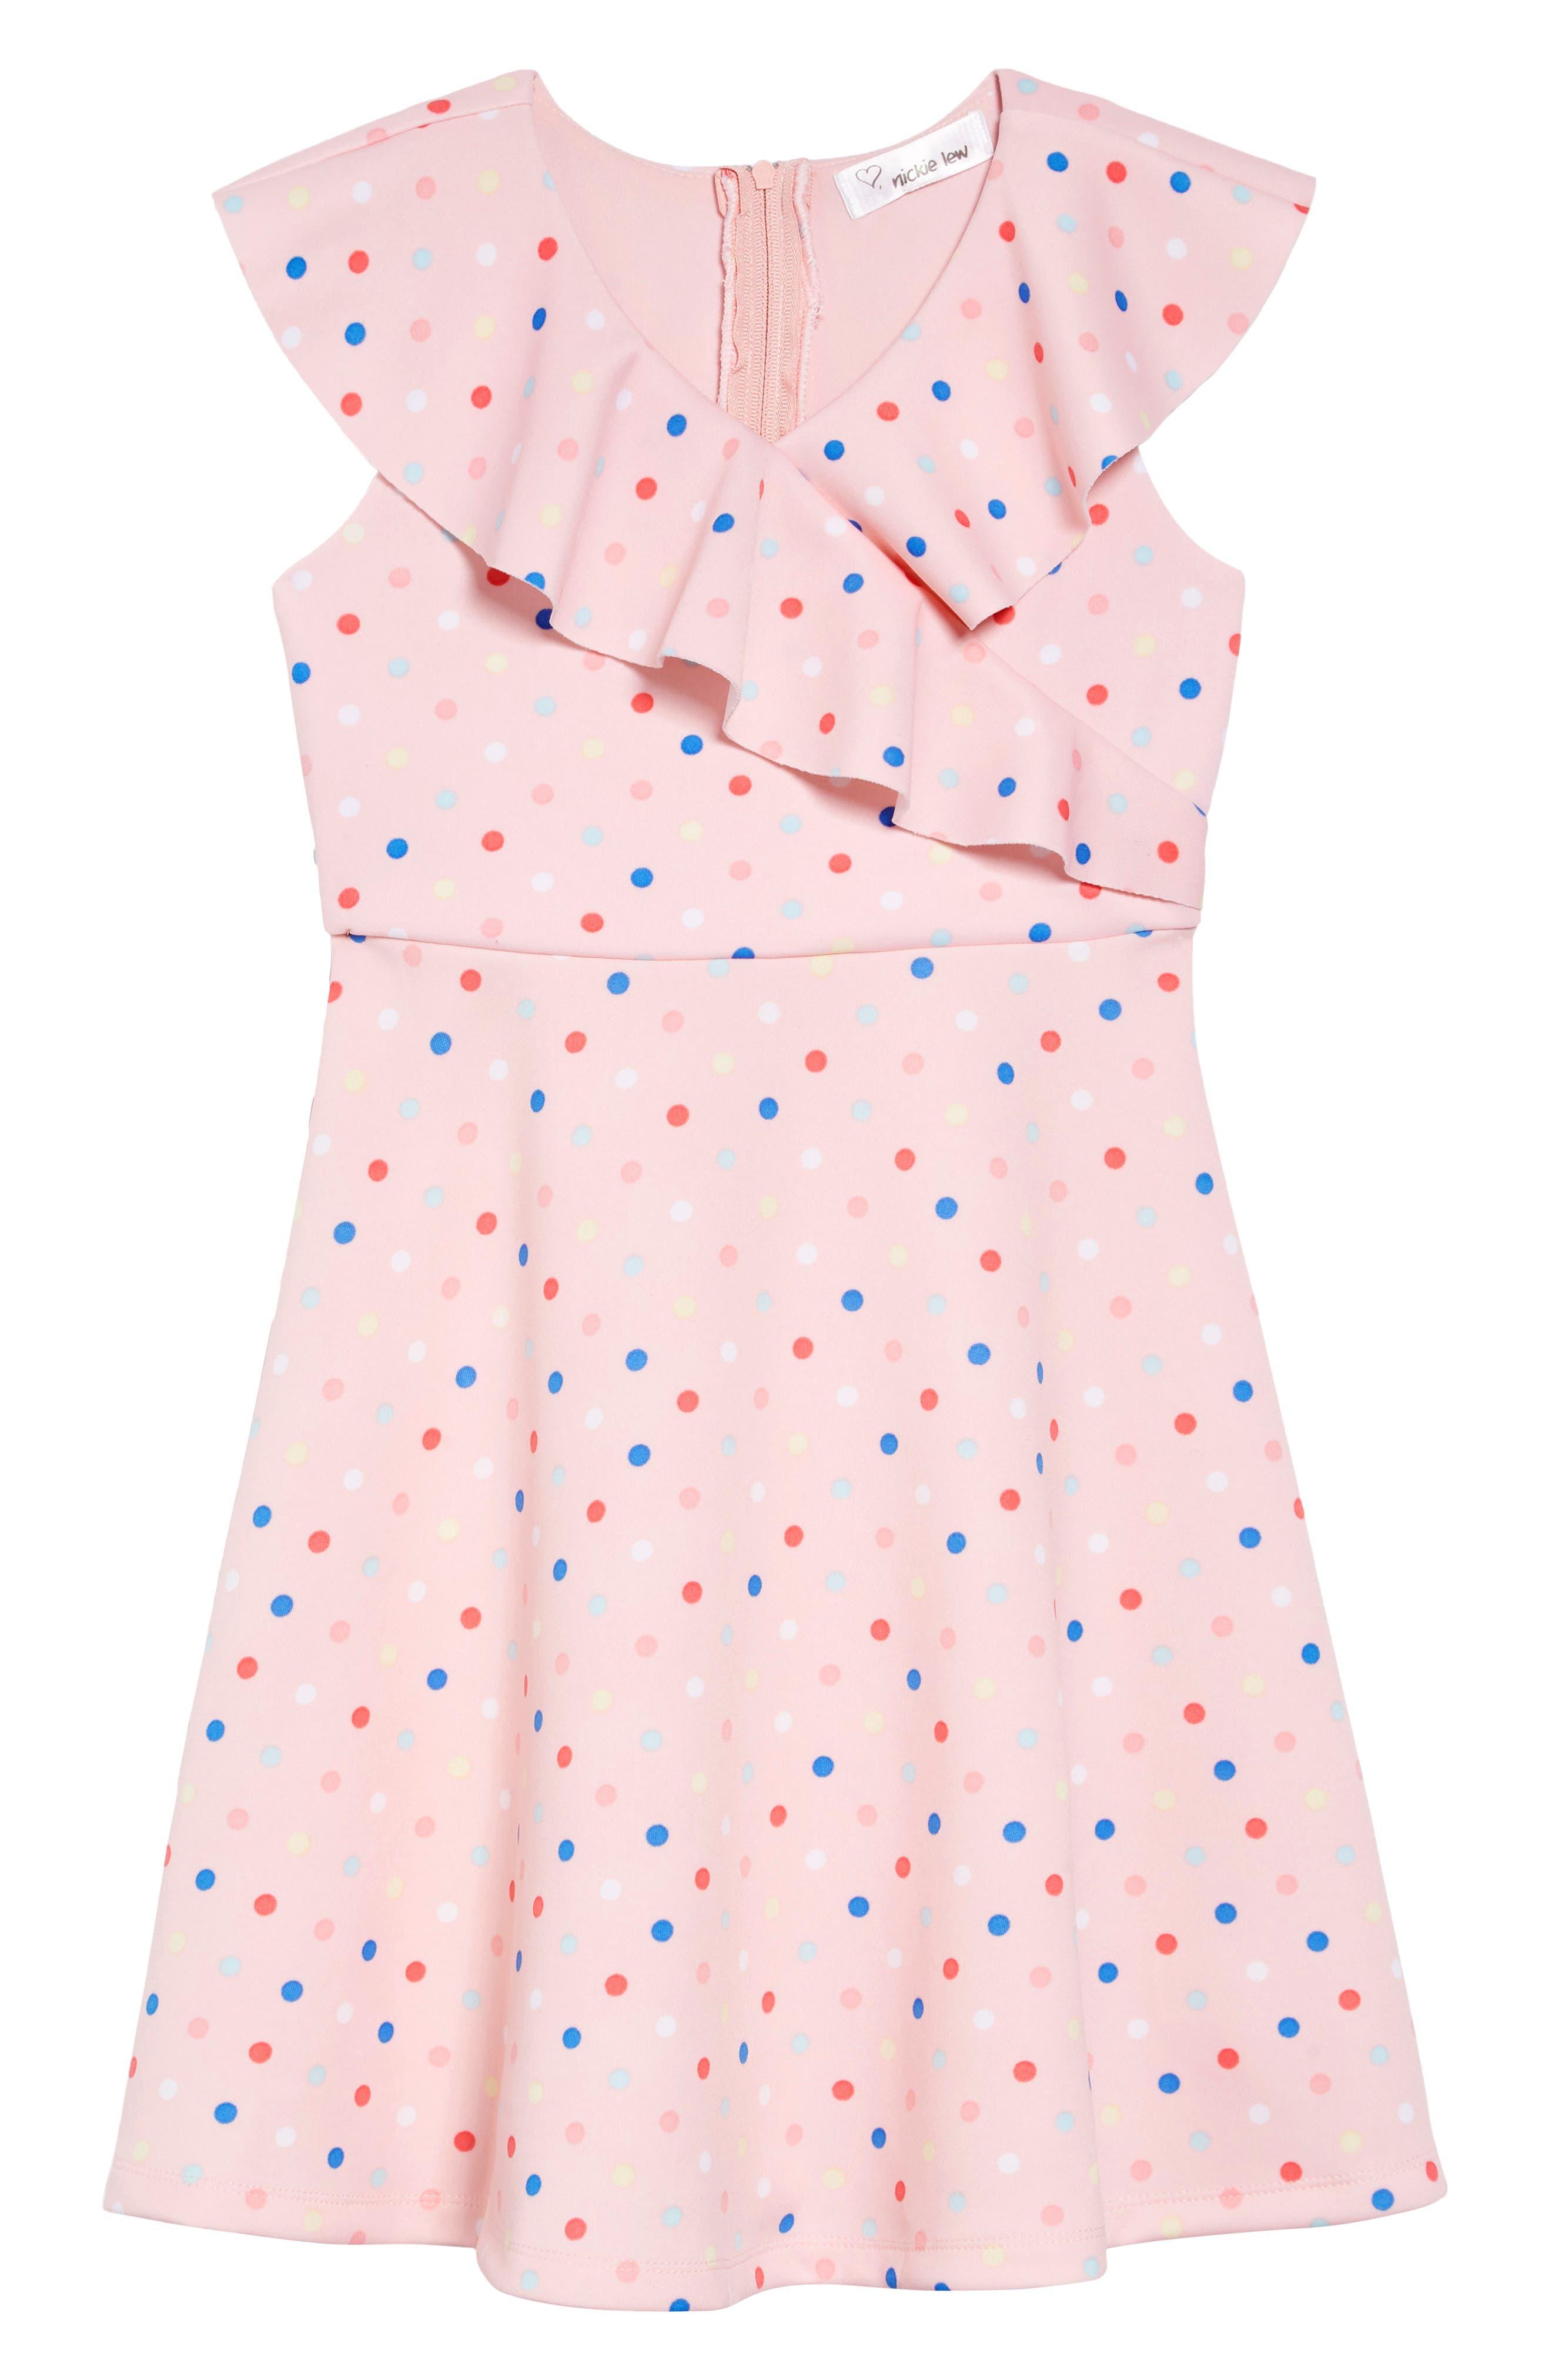 Ruffle Polka Dot Dress, Main, color, 693